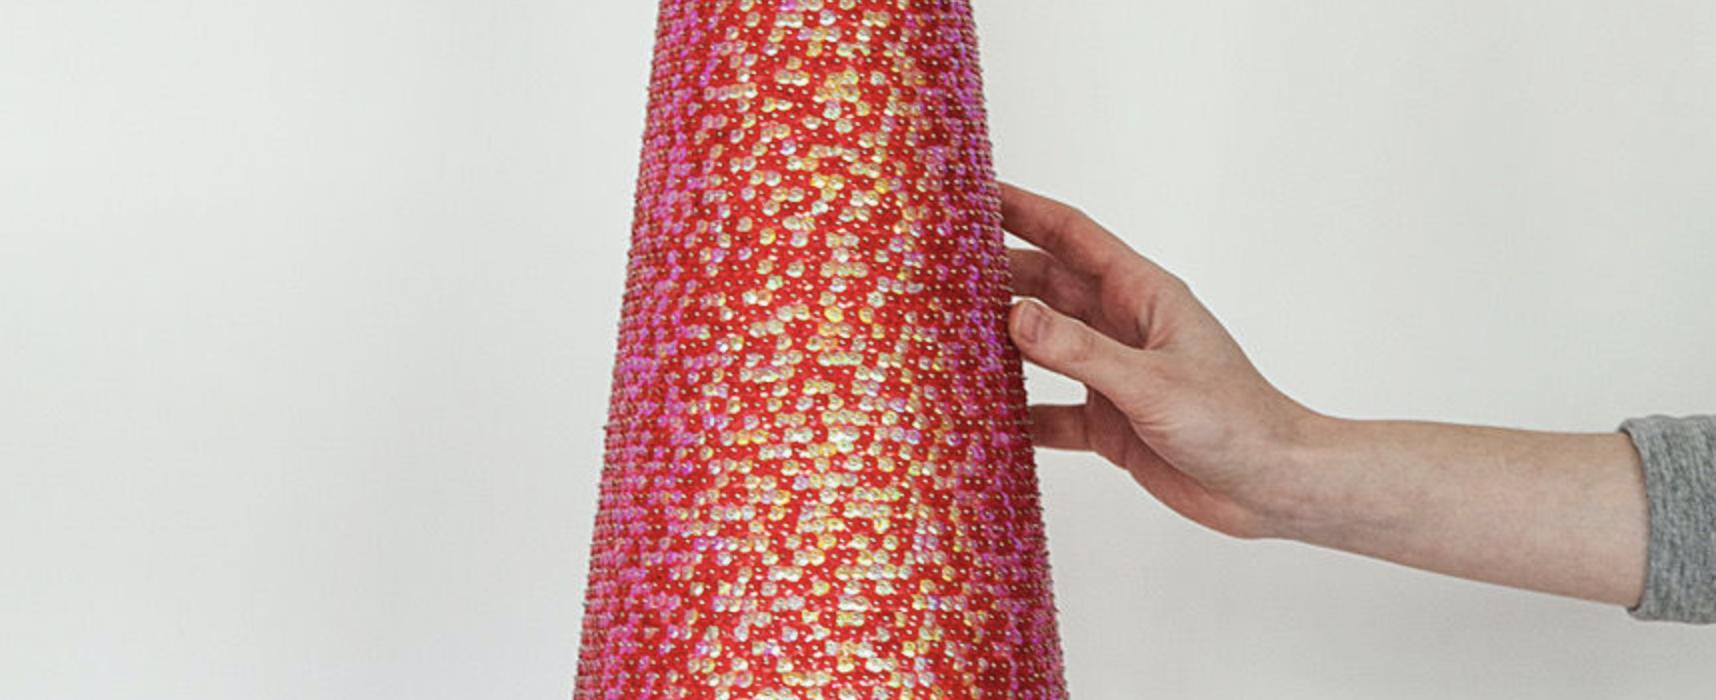 Markus Hanakam & Roswitha Schuller, Freudenspitz (Pleasure Peak), 2018, Pailletten auf Styropor, h = 80 cm